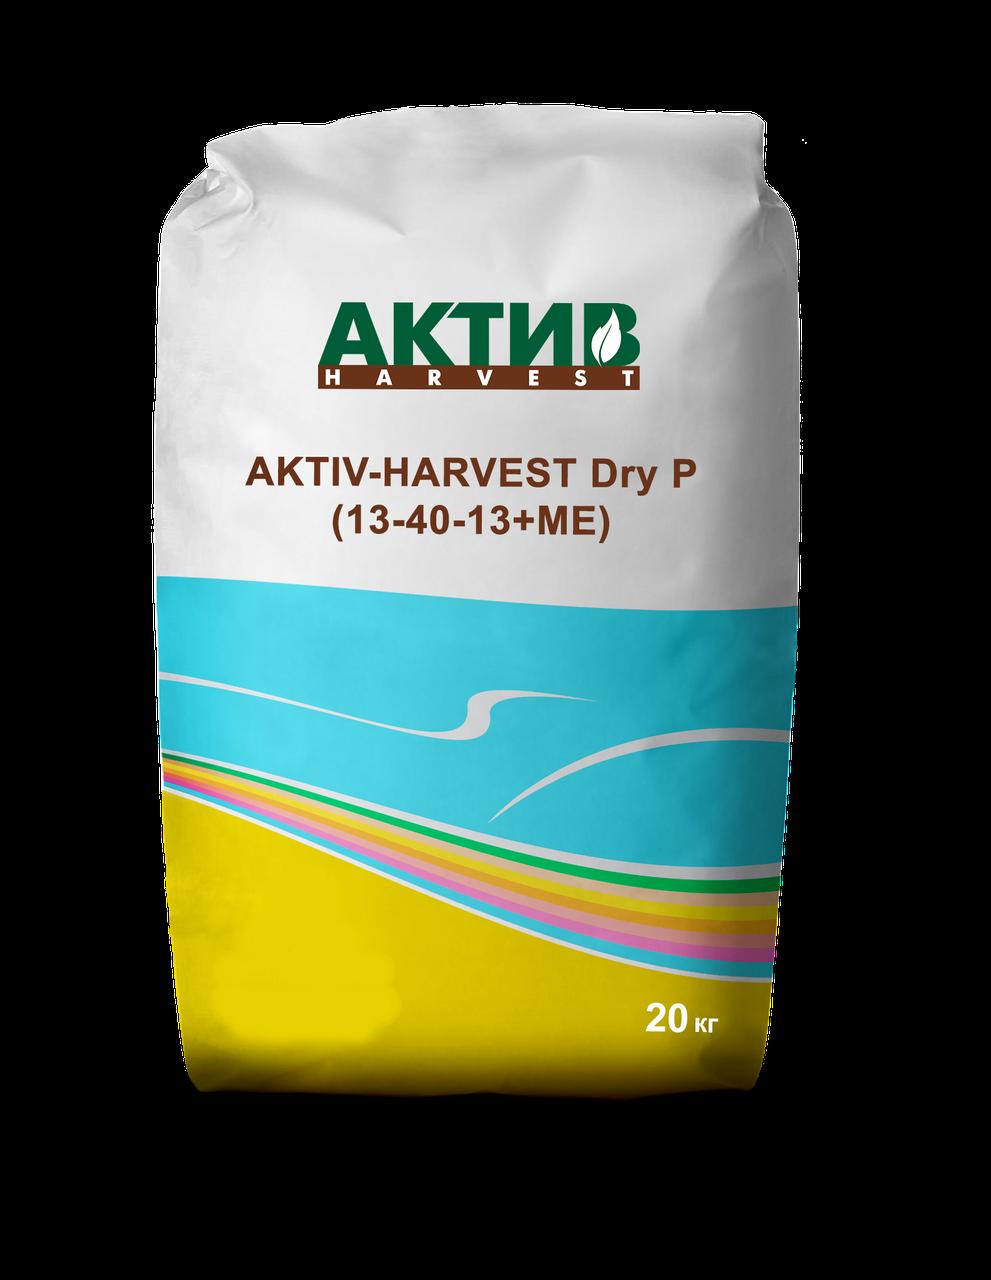 Мікродобриво Актив-Харвест Dry P (13-40-13+МЕ)